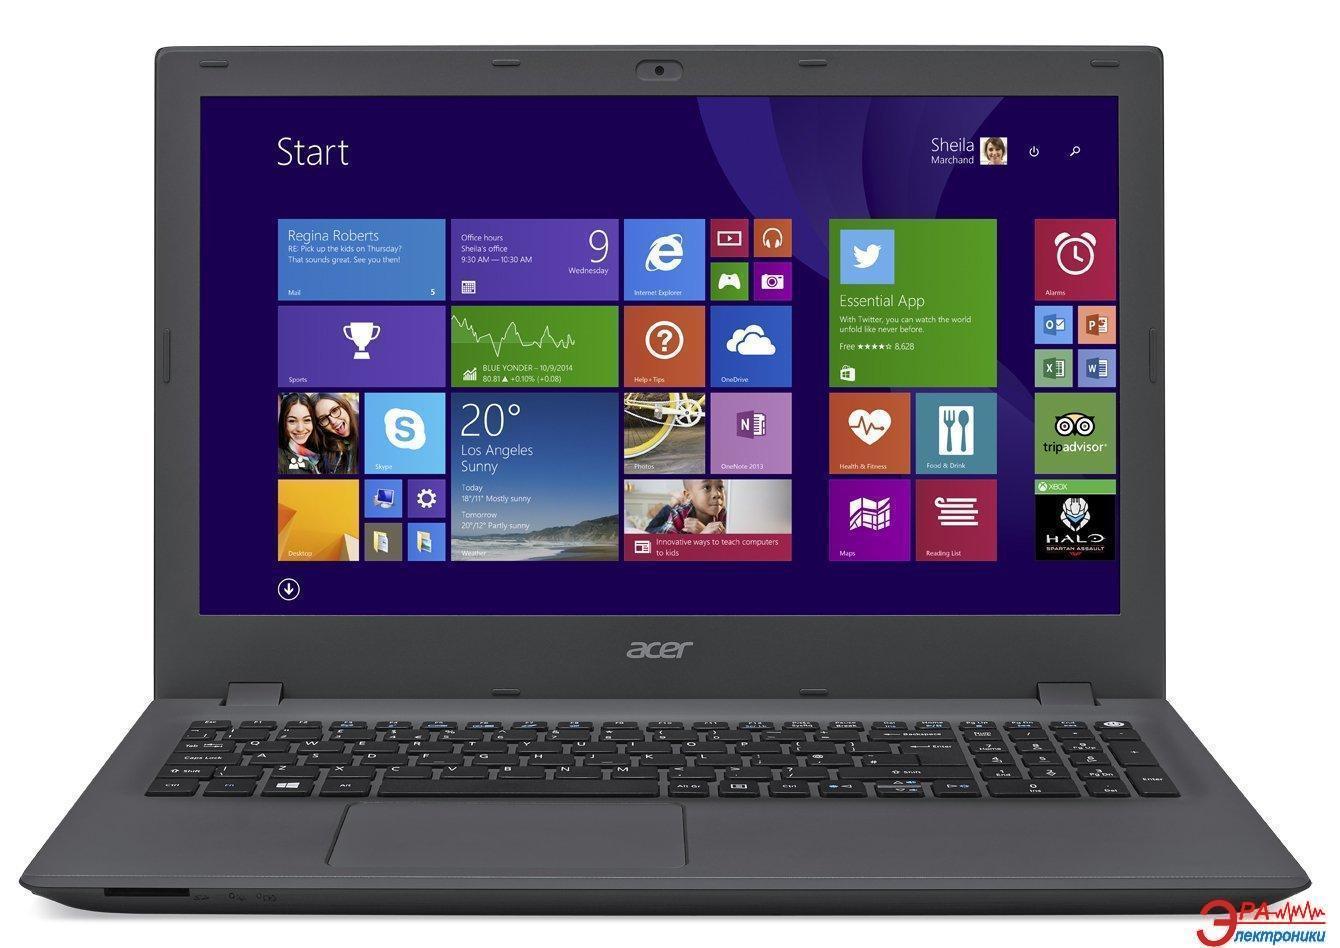 Ноутбук Acer Aspire E5-573G-76KH (NX.MVREU.015) Black Grey 15,6